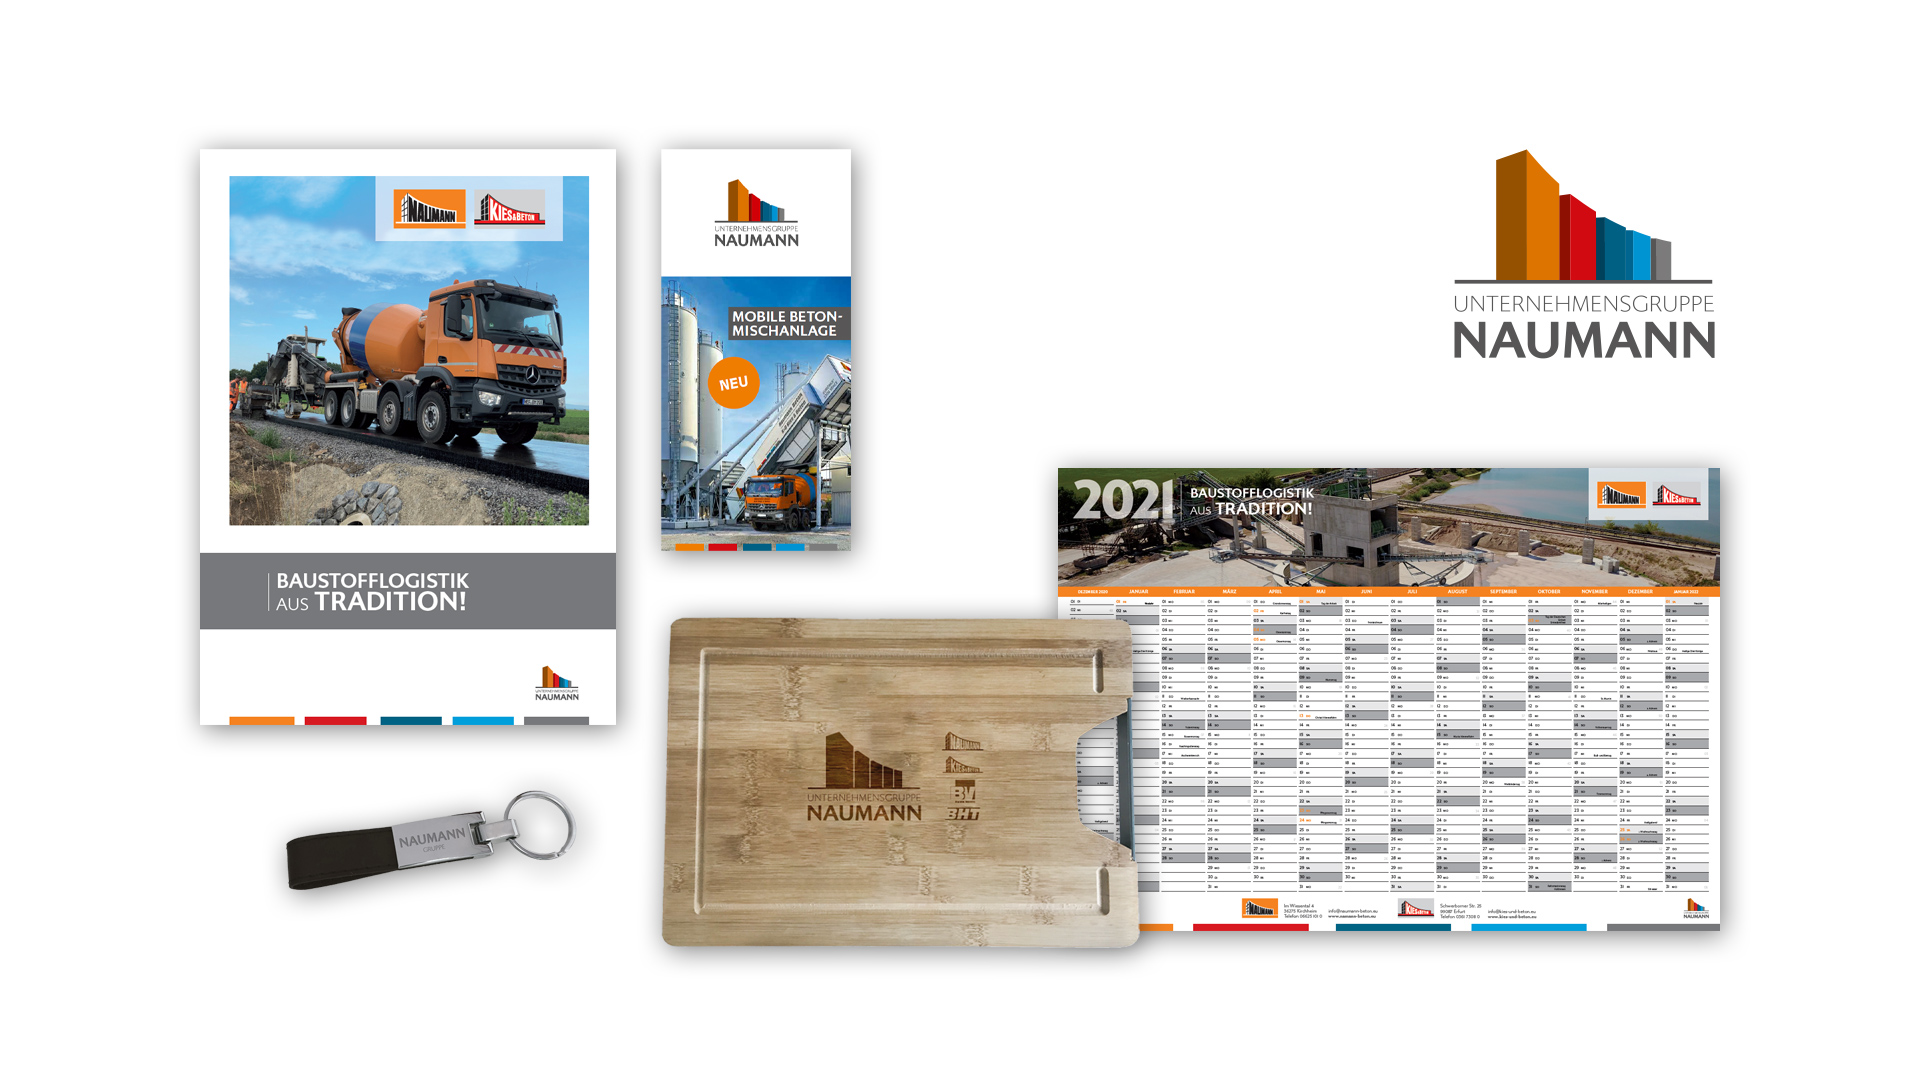 Corporate Design – Unternehmensgruppe Naumann